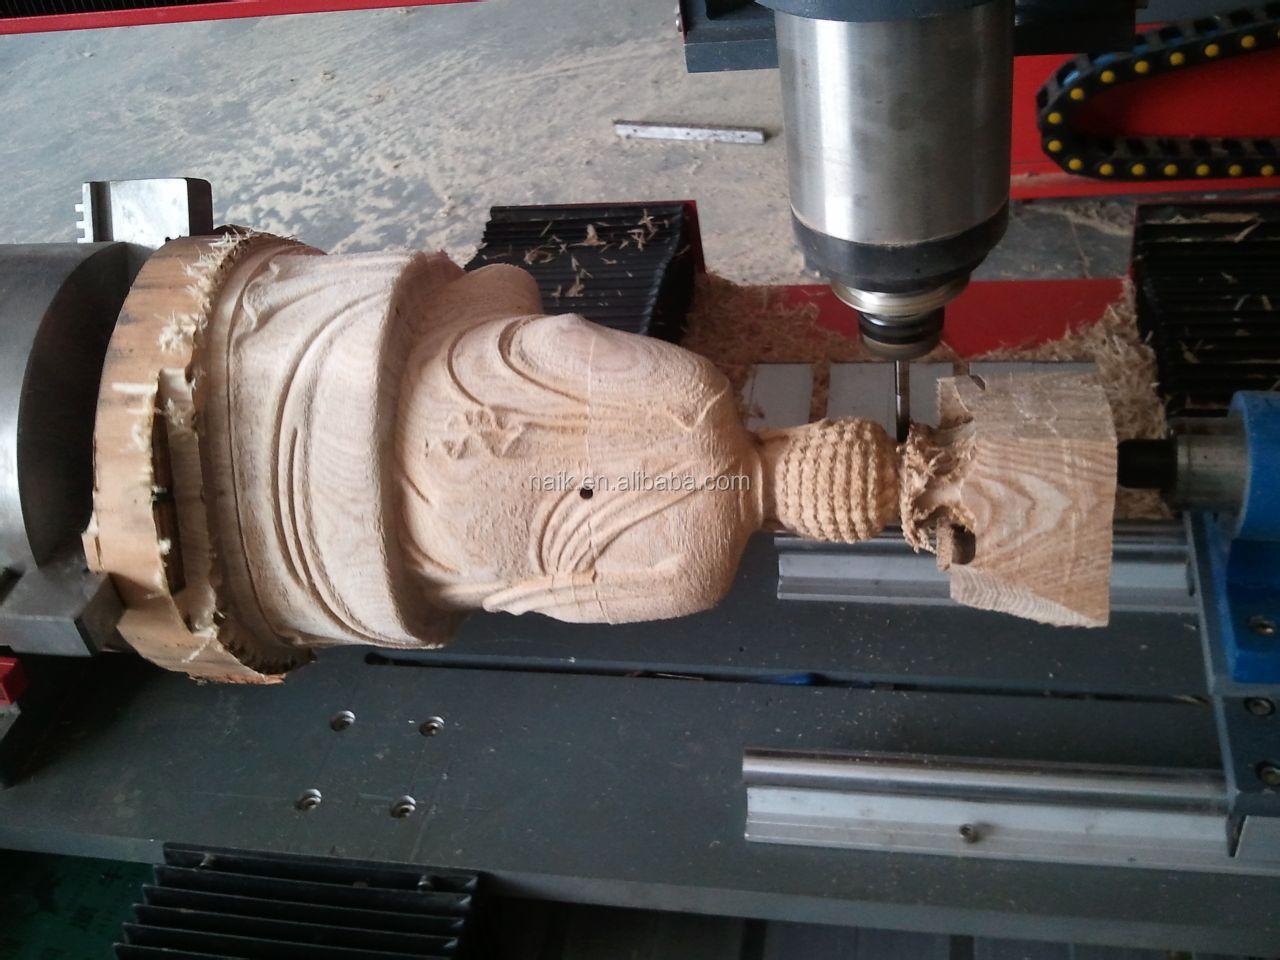 Pop Design Best Price Hot Sale Cnc Wood Engraving